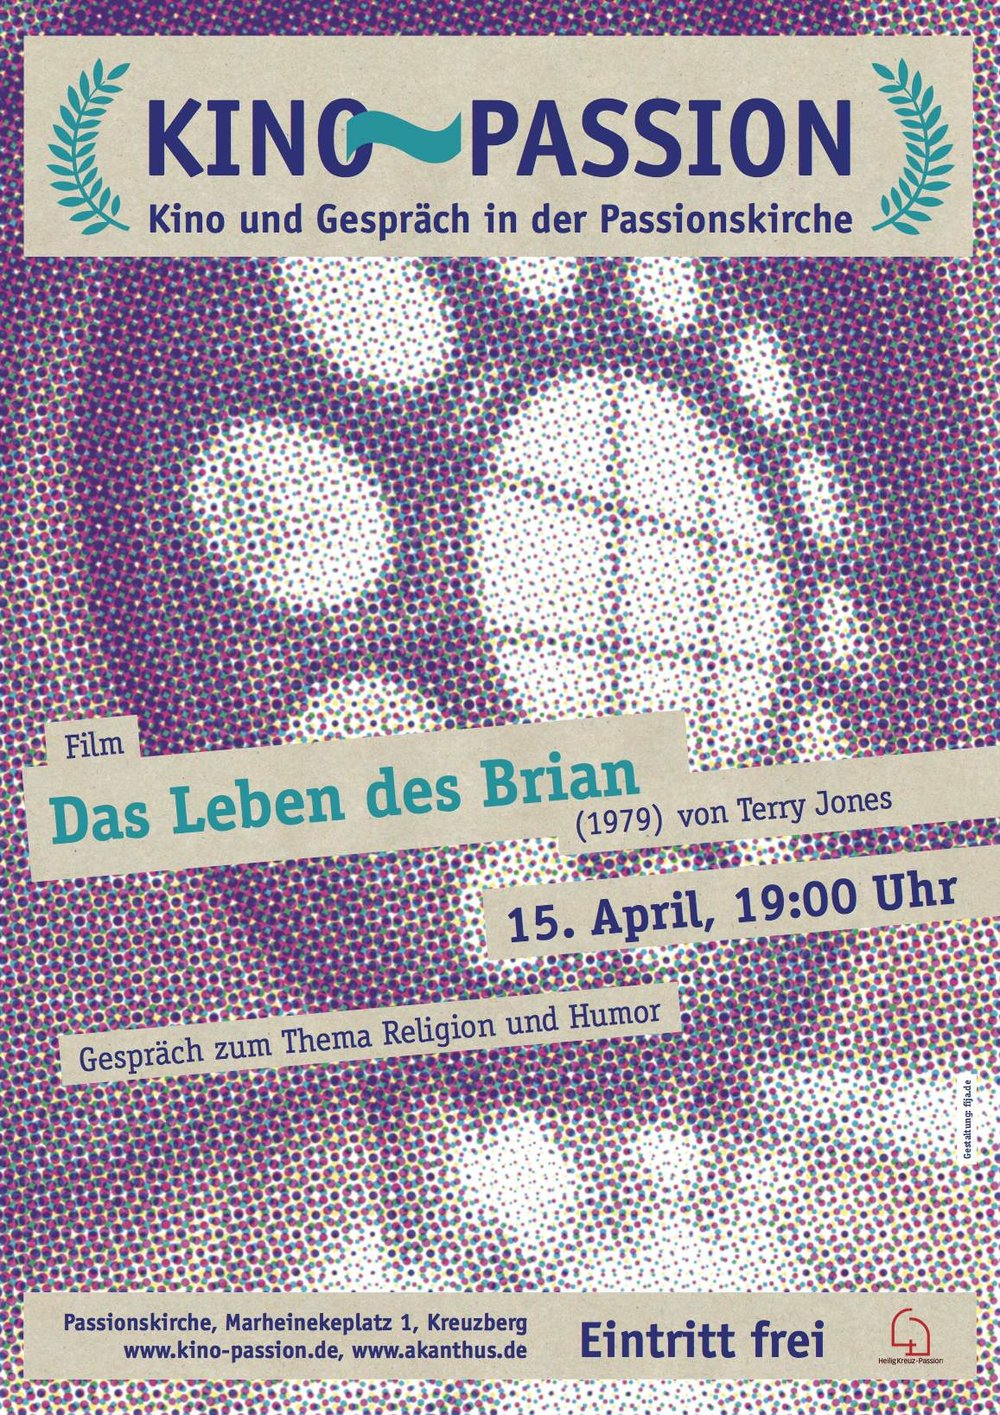 99_Kino_Passion_Das Leben des Brian.jpg